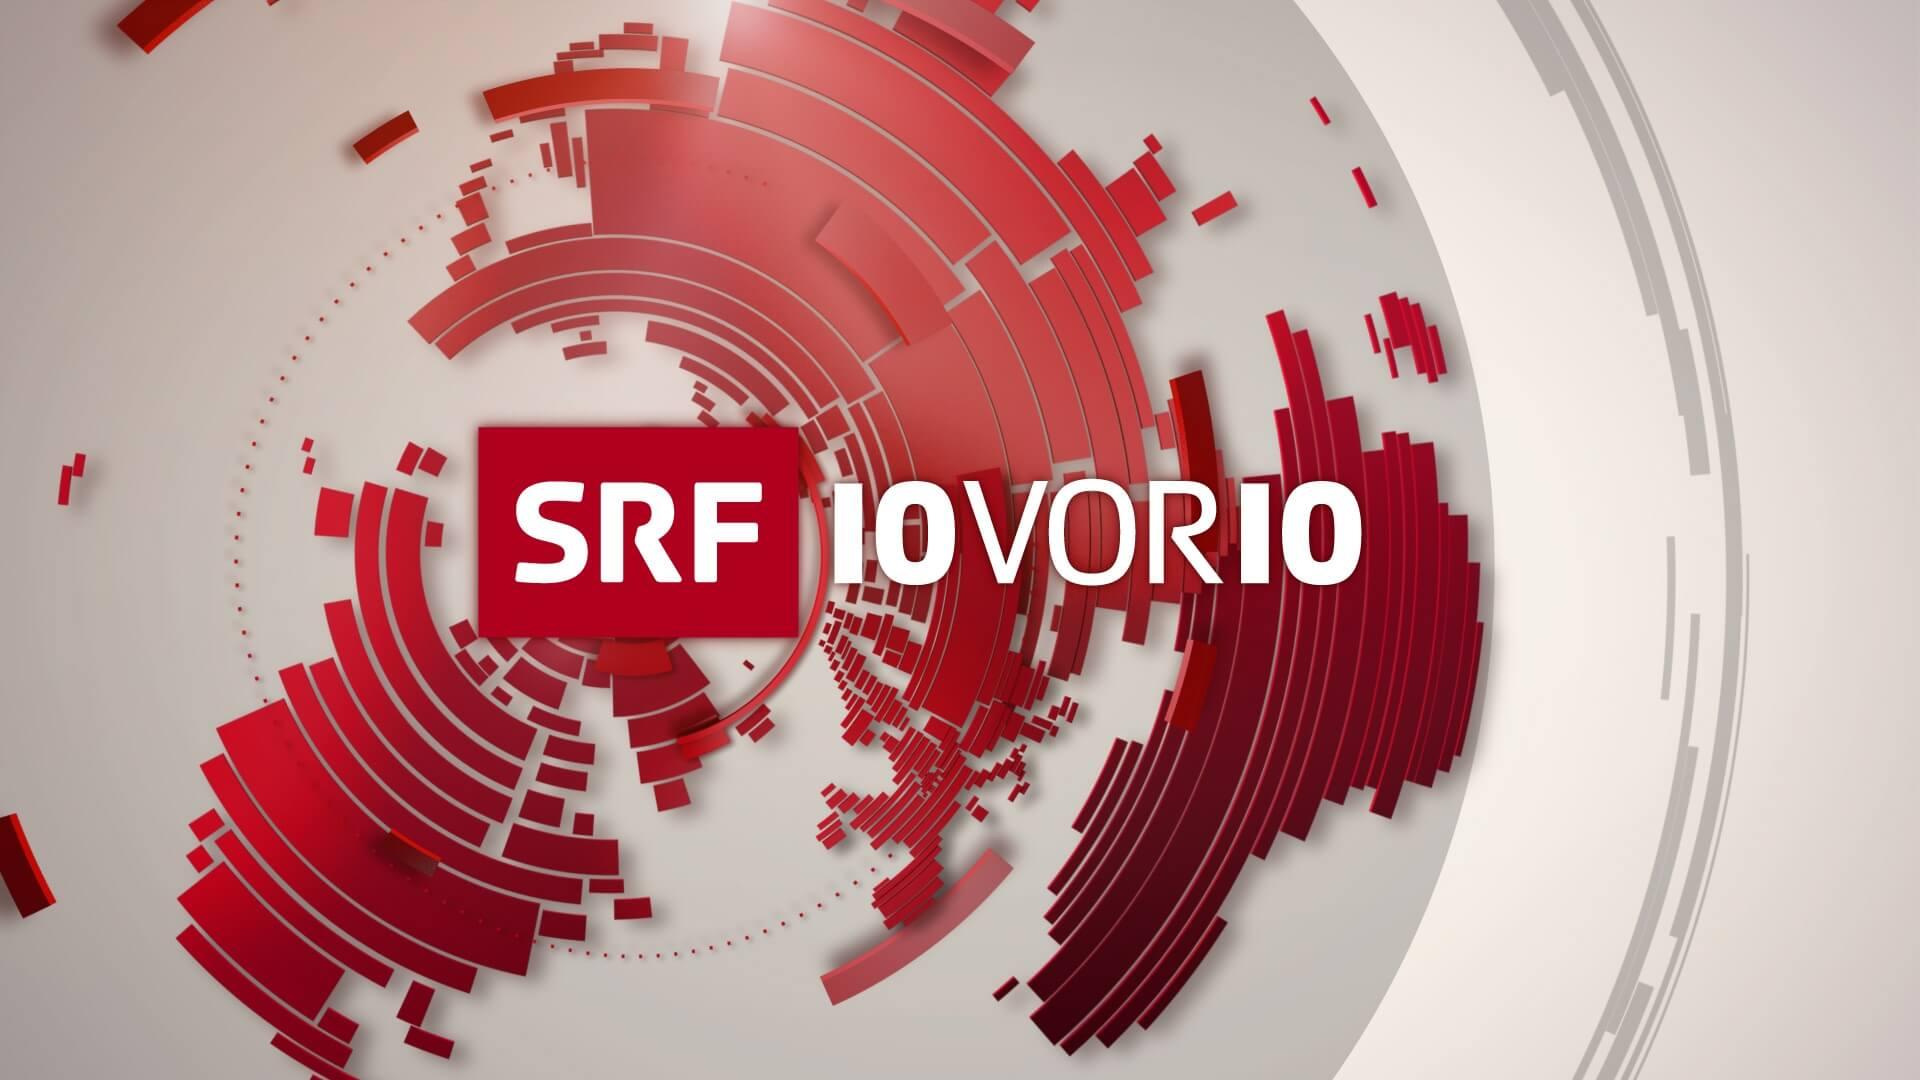 SFR Swiss Television Features Koen Olthuis And Schoonschip